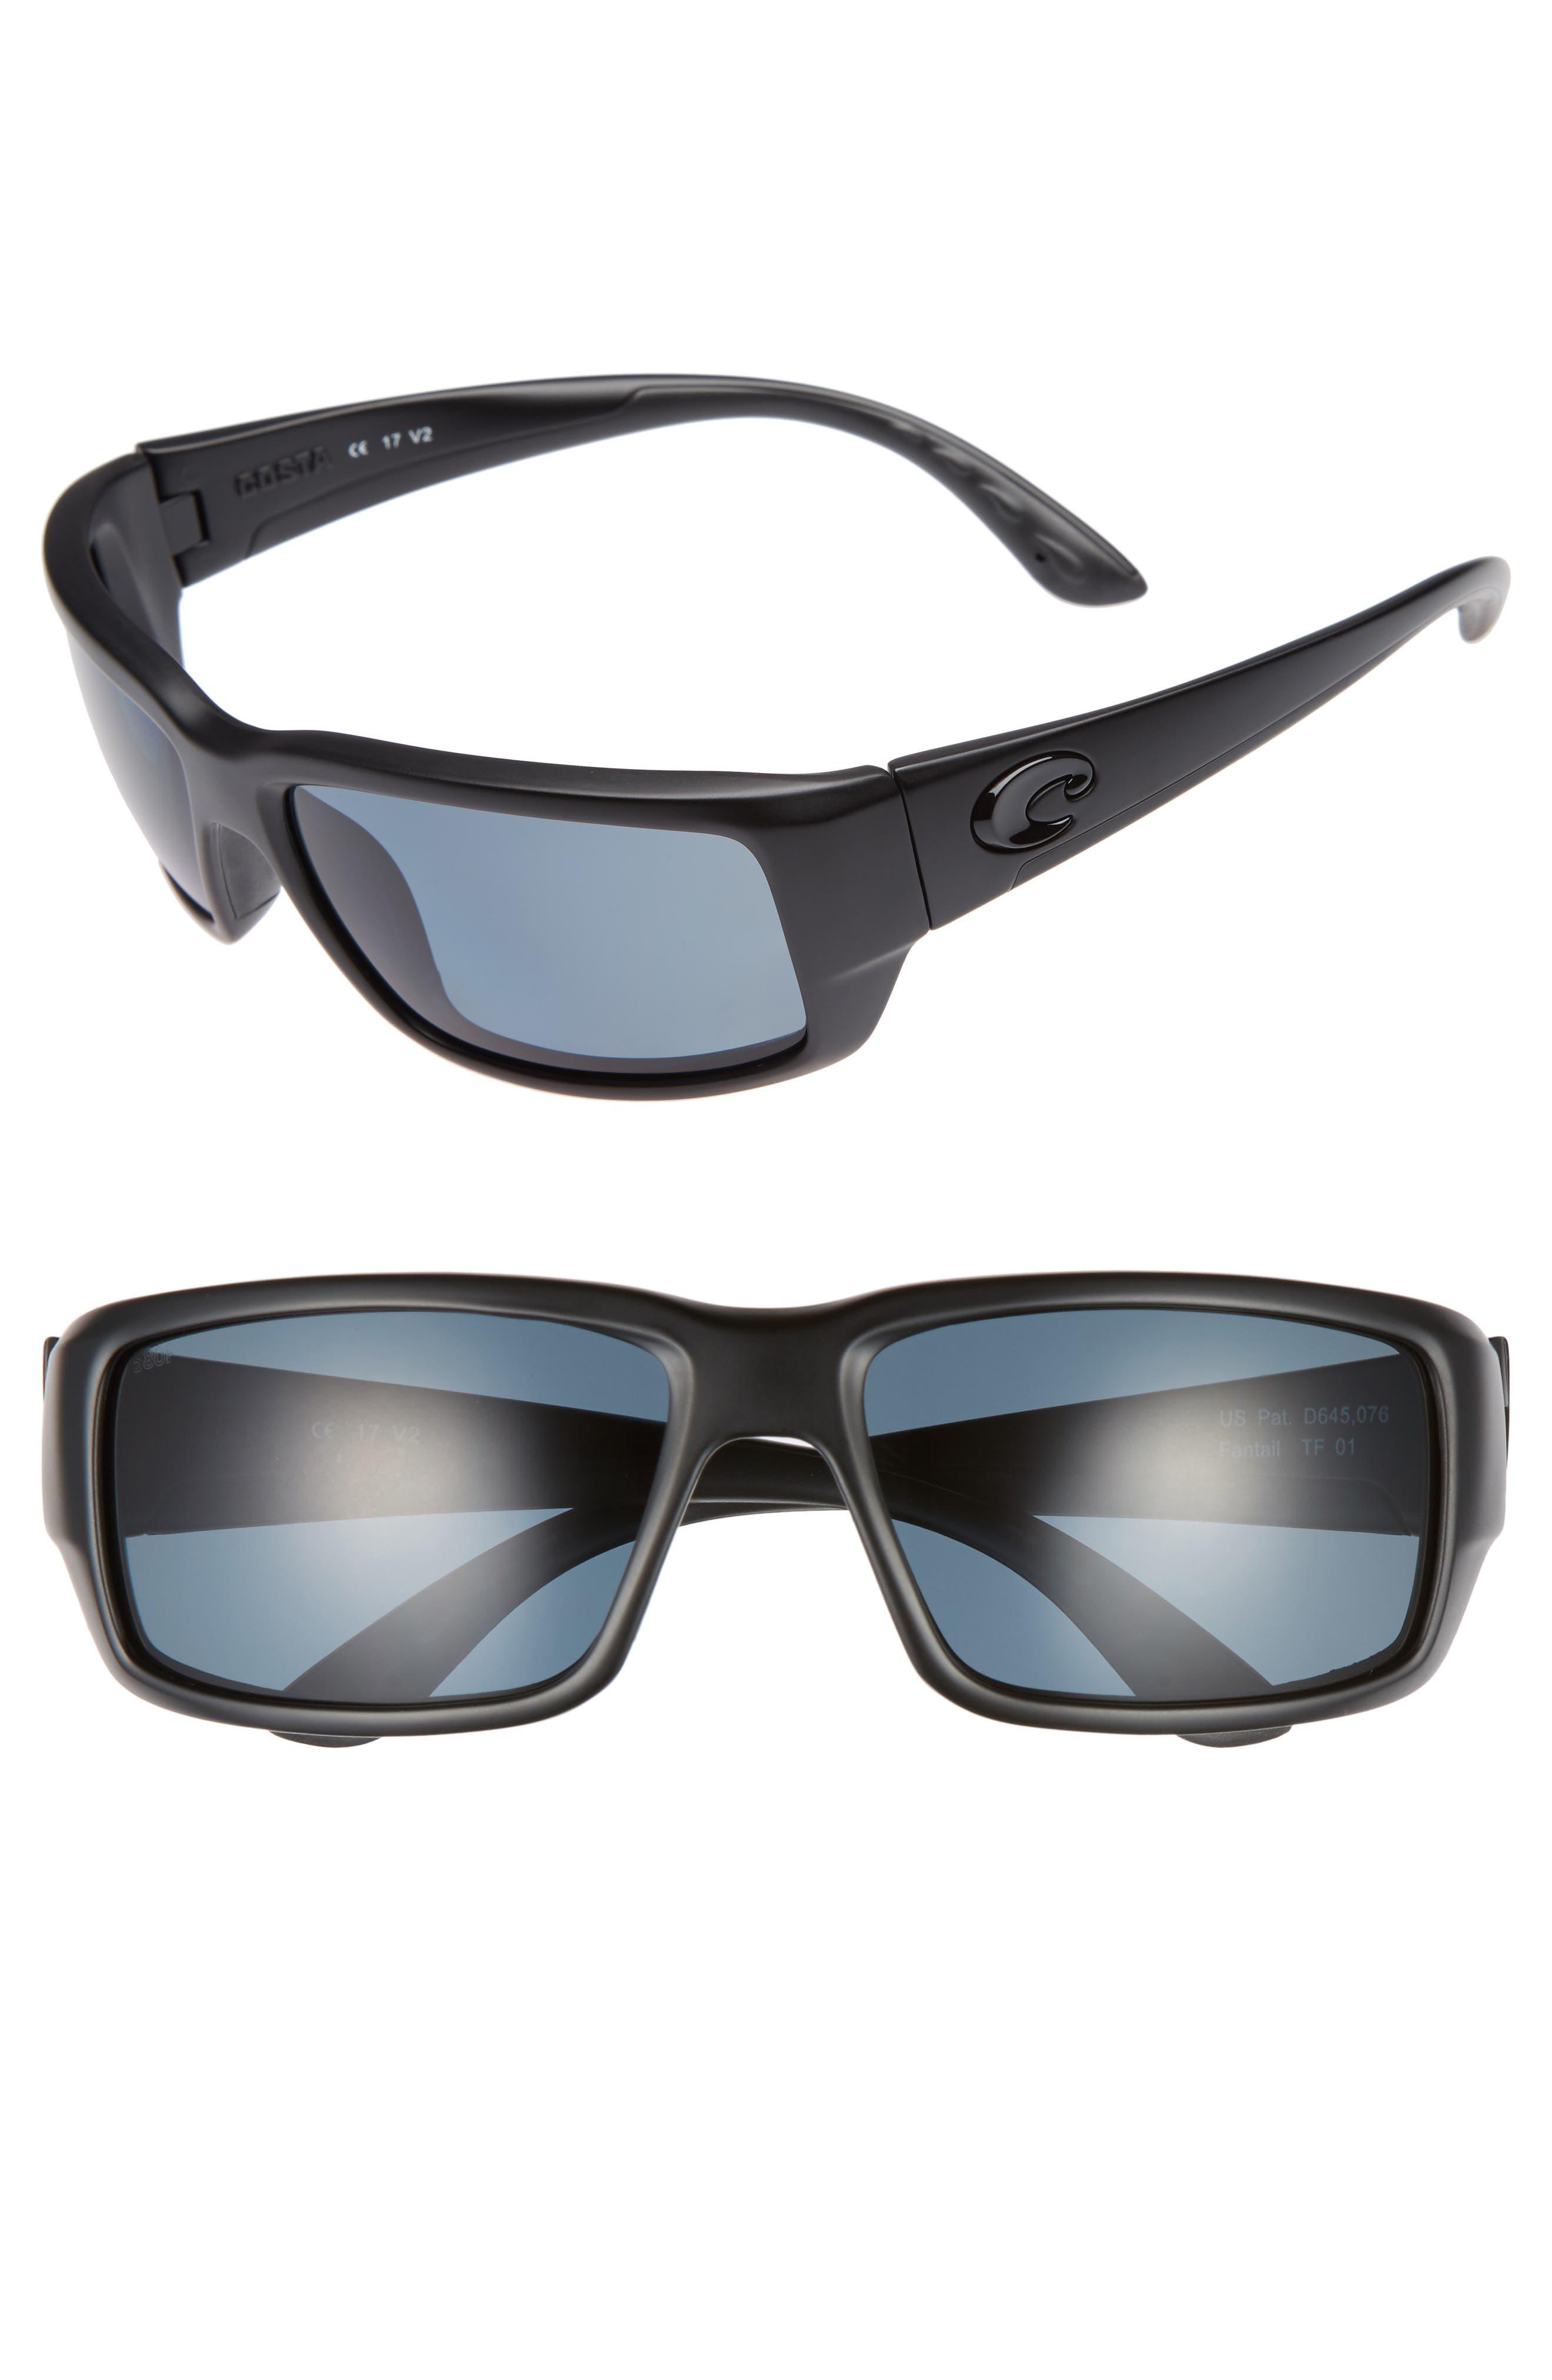 Fantail 60mm Polarized Sunglasses